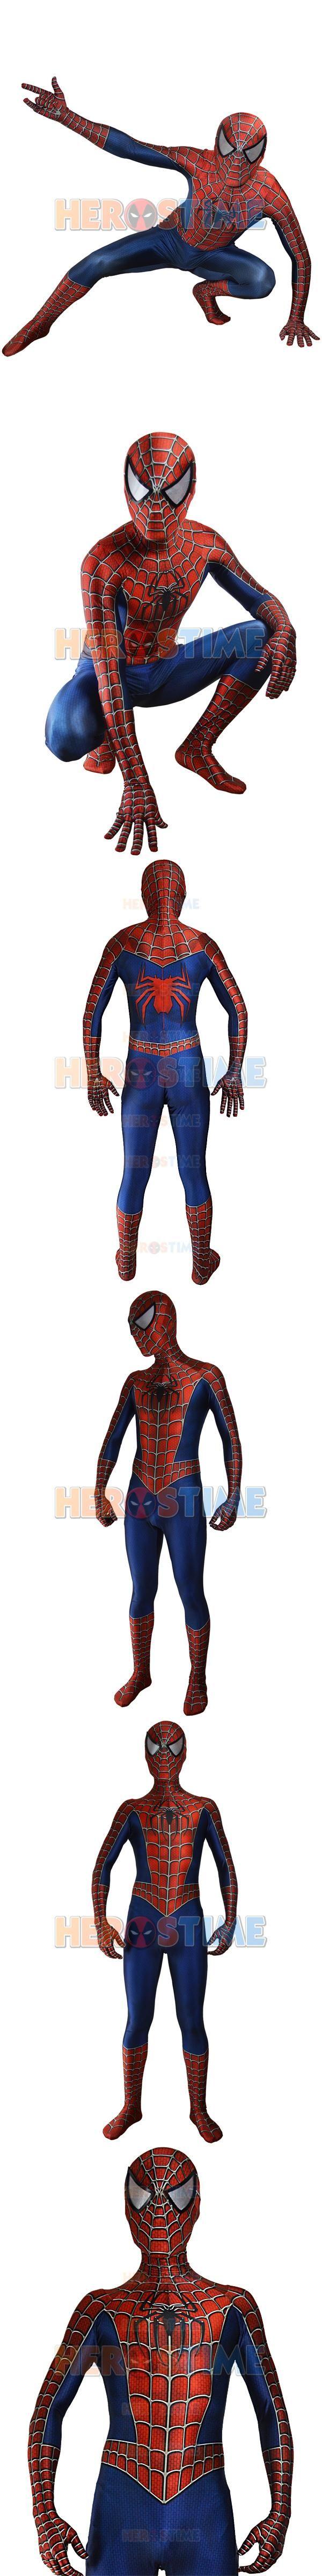 best 25 spiderman cosplay ideas on pinterest videos of